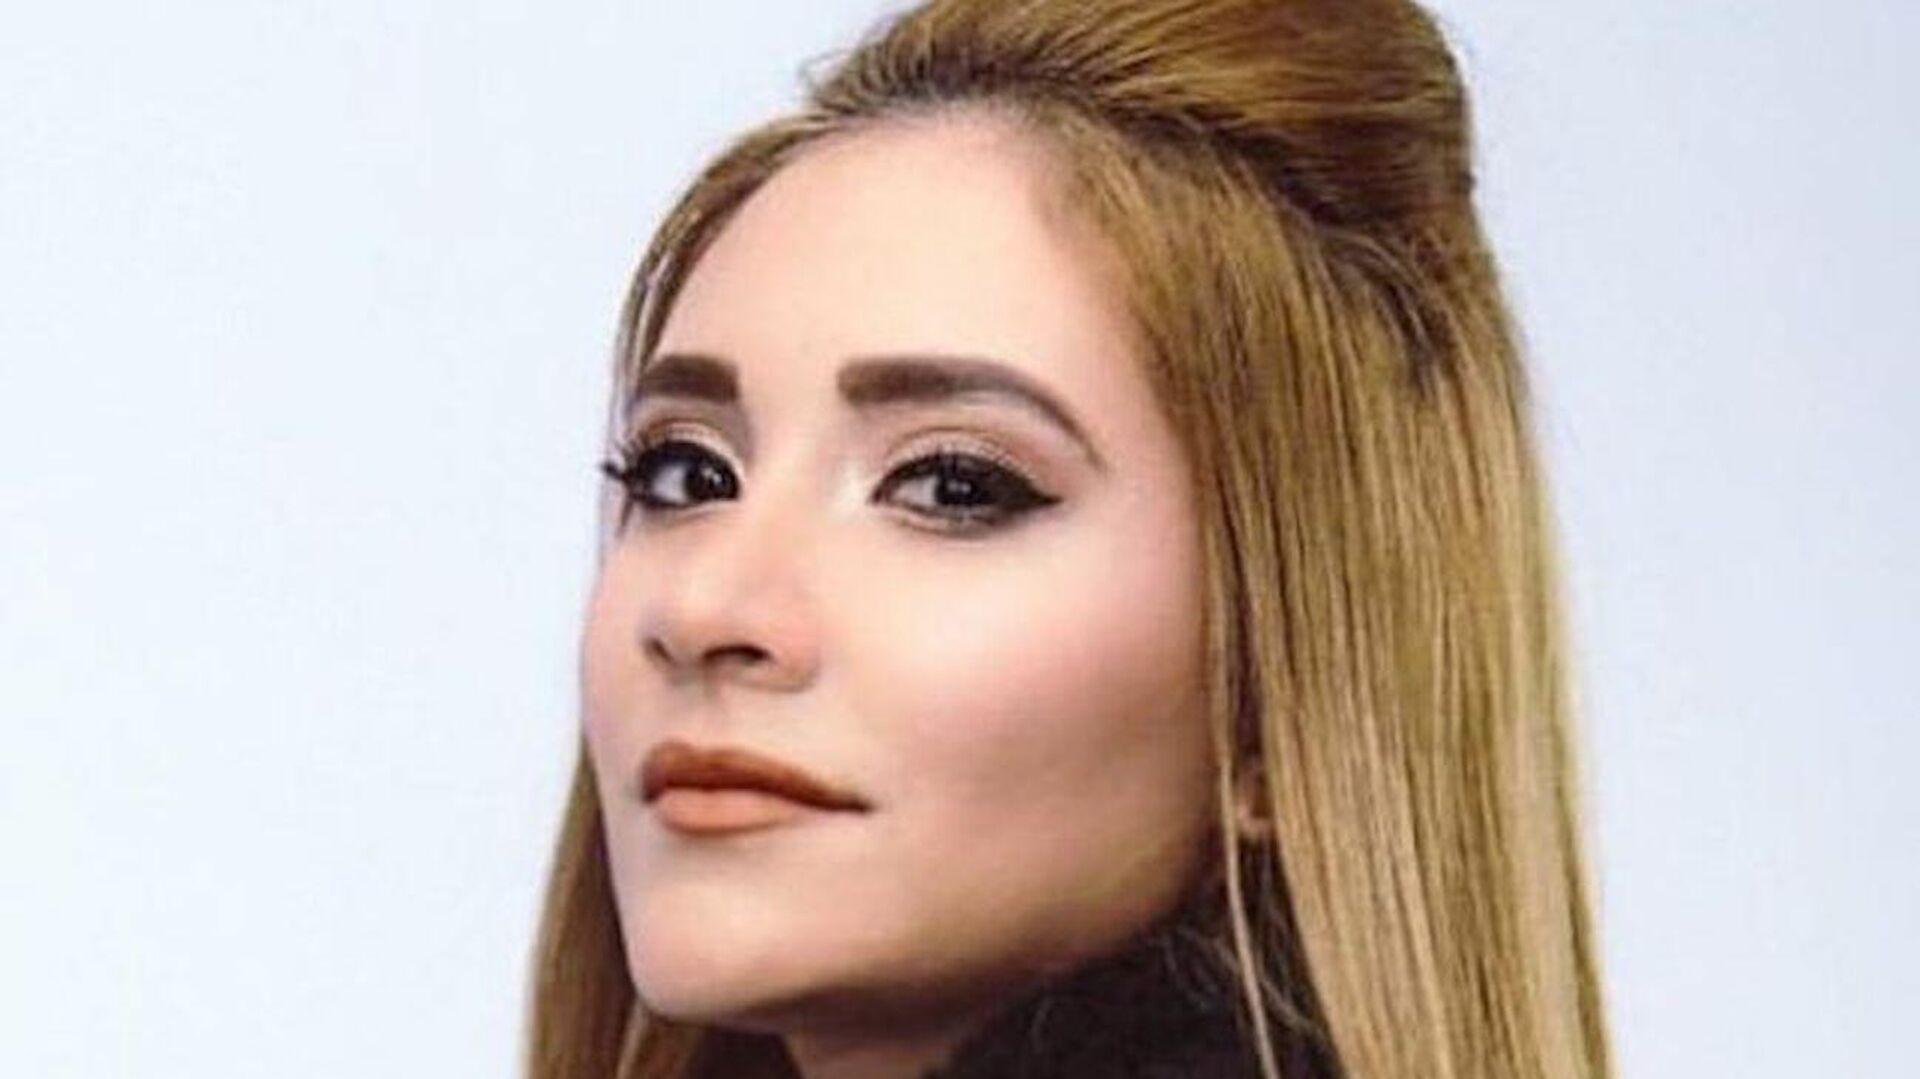 Diana Aponte, cantante colombiana - Sputnik Mundo, 1920, 12.04.2021